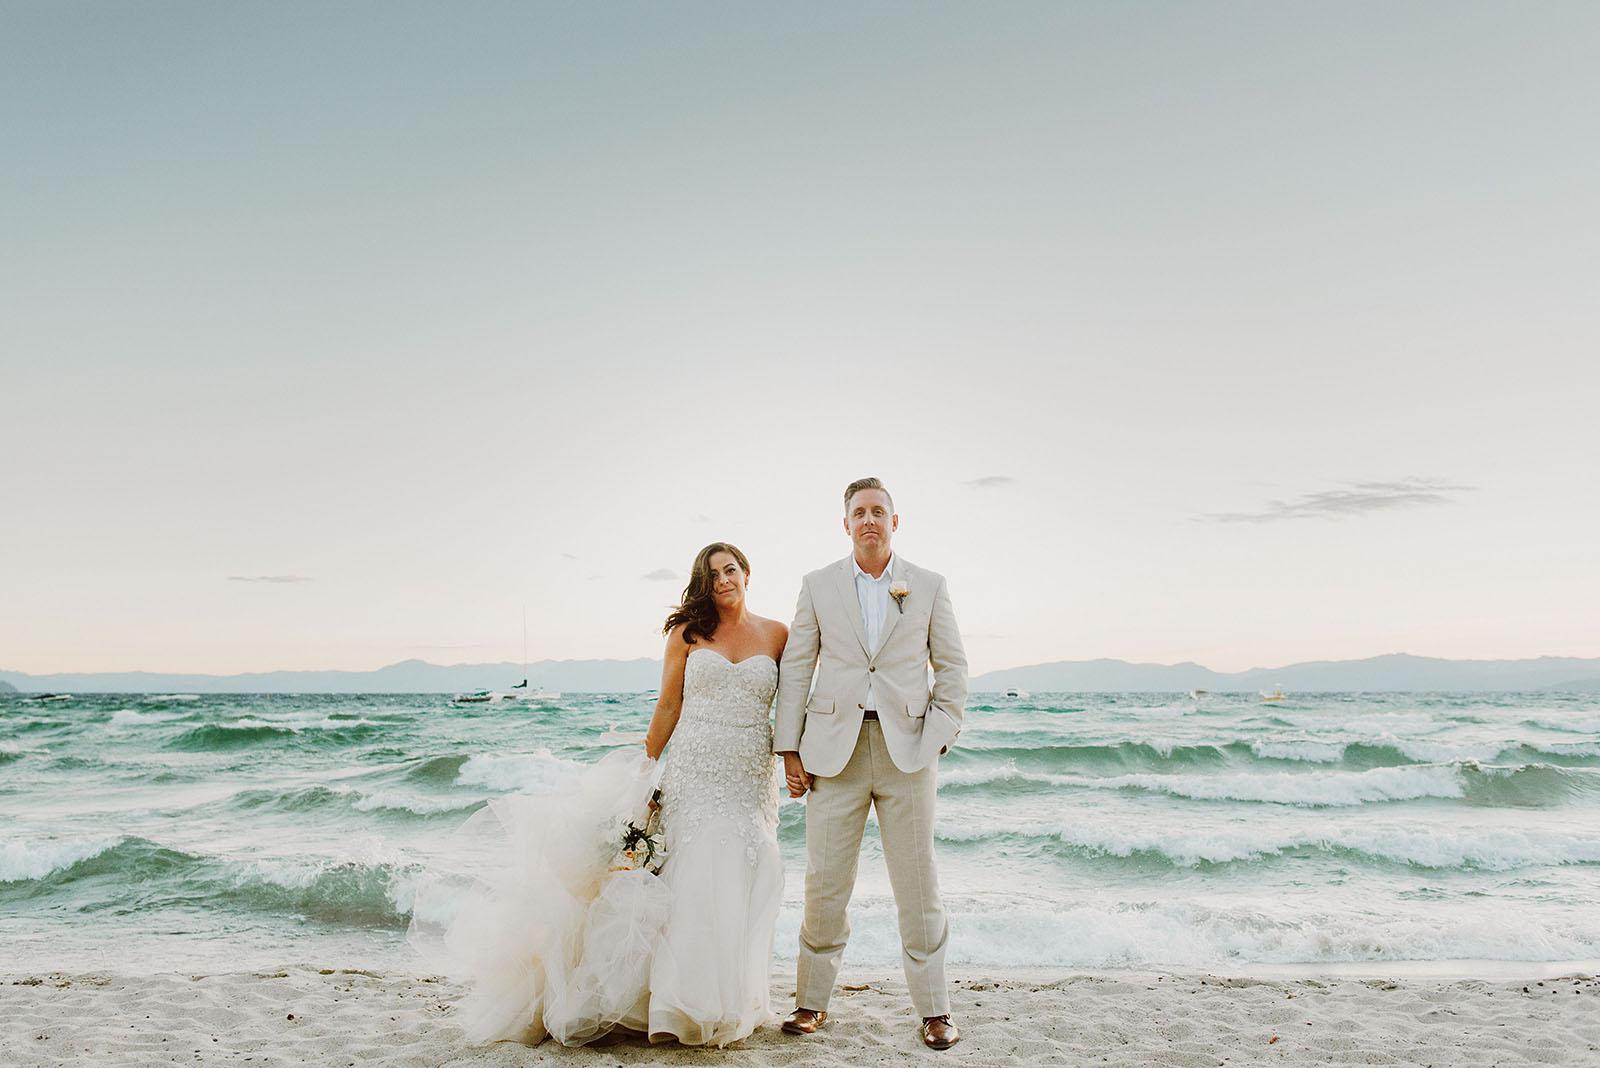 Waves crashing behind Bride and Groom at an Incline Village wedding